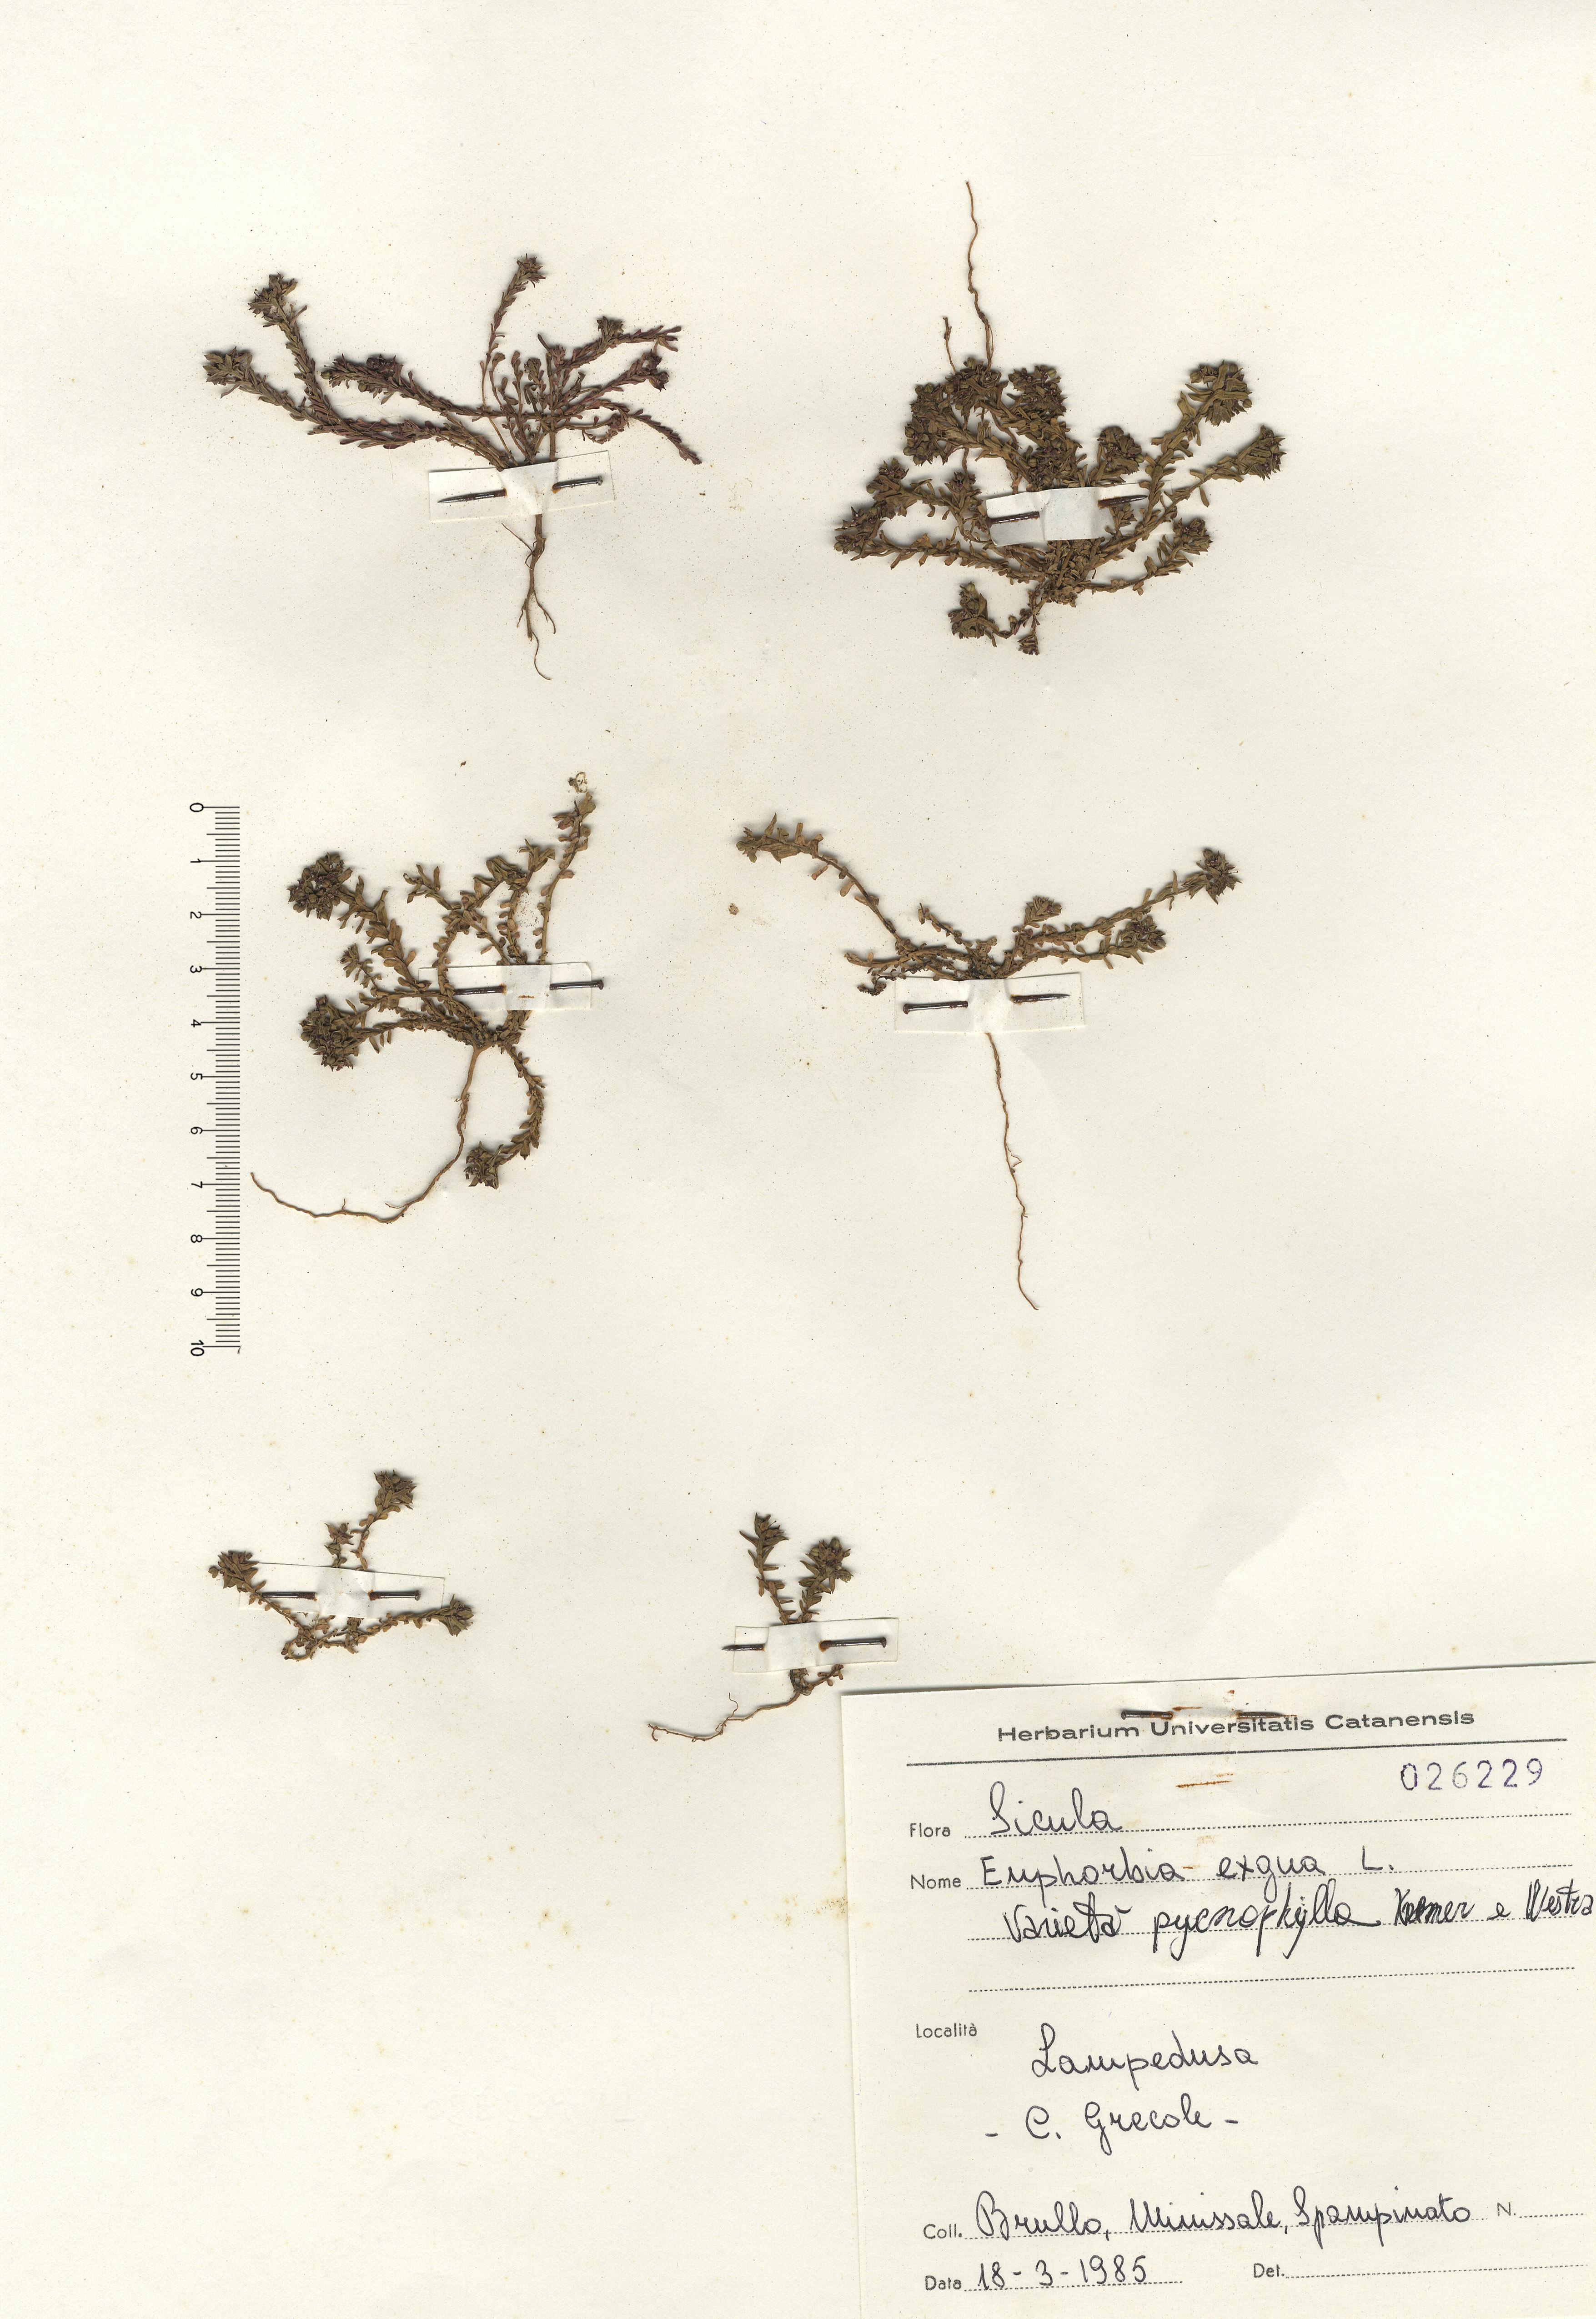 © Hortus Botanicus Catinens - Herb. shhet 026229<br>